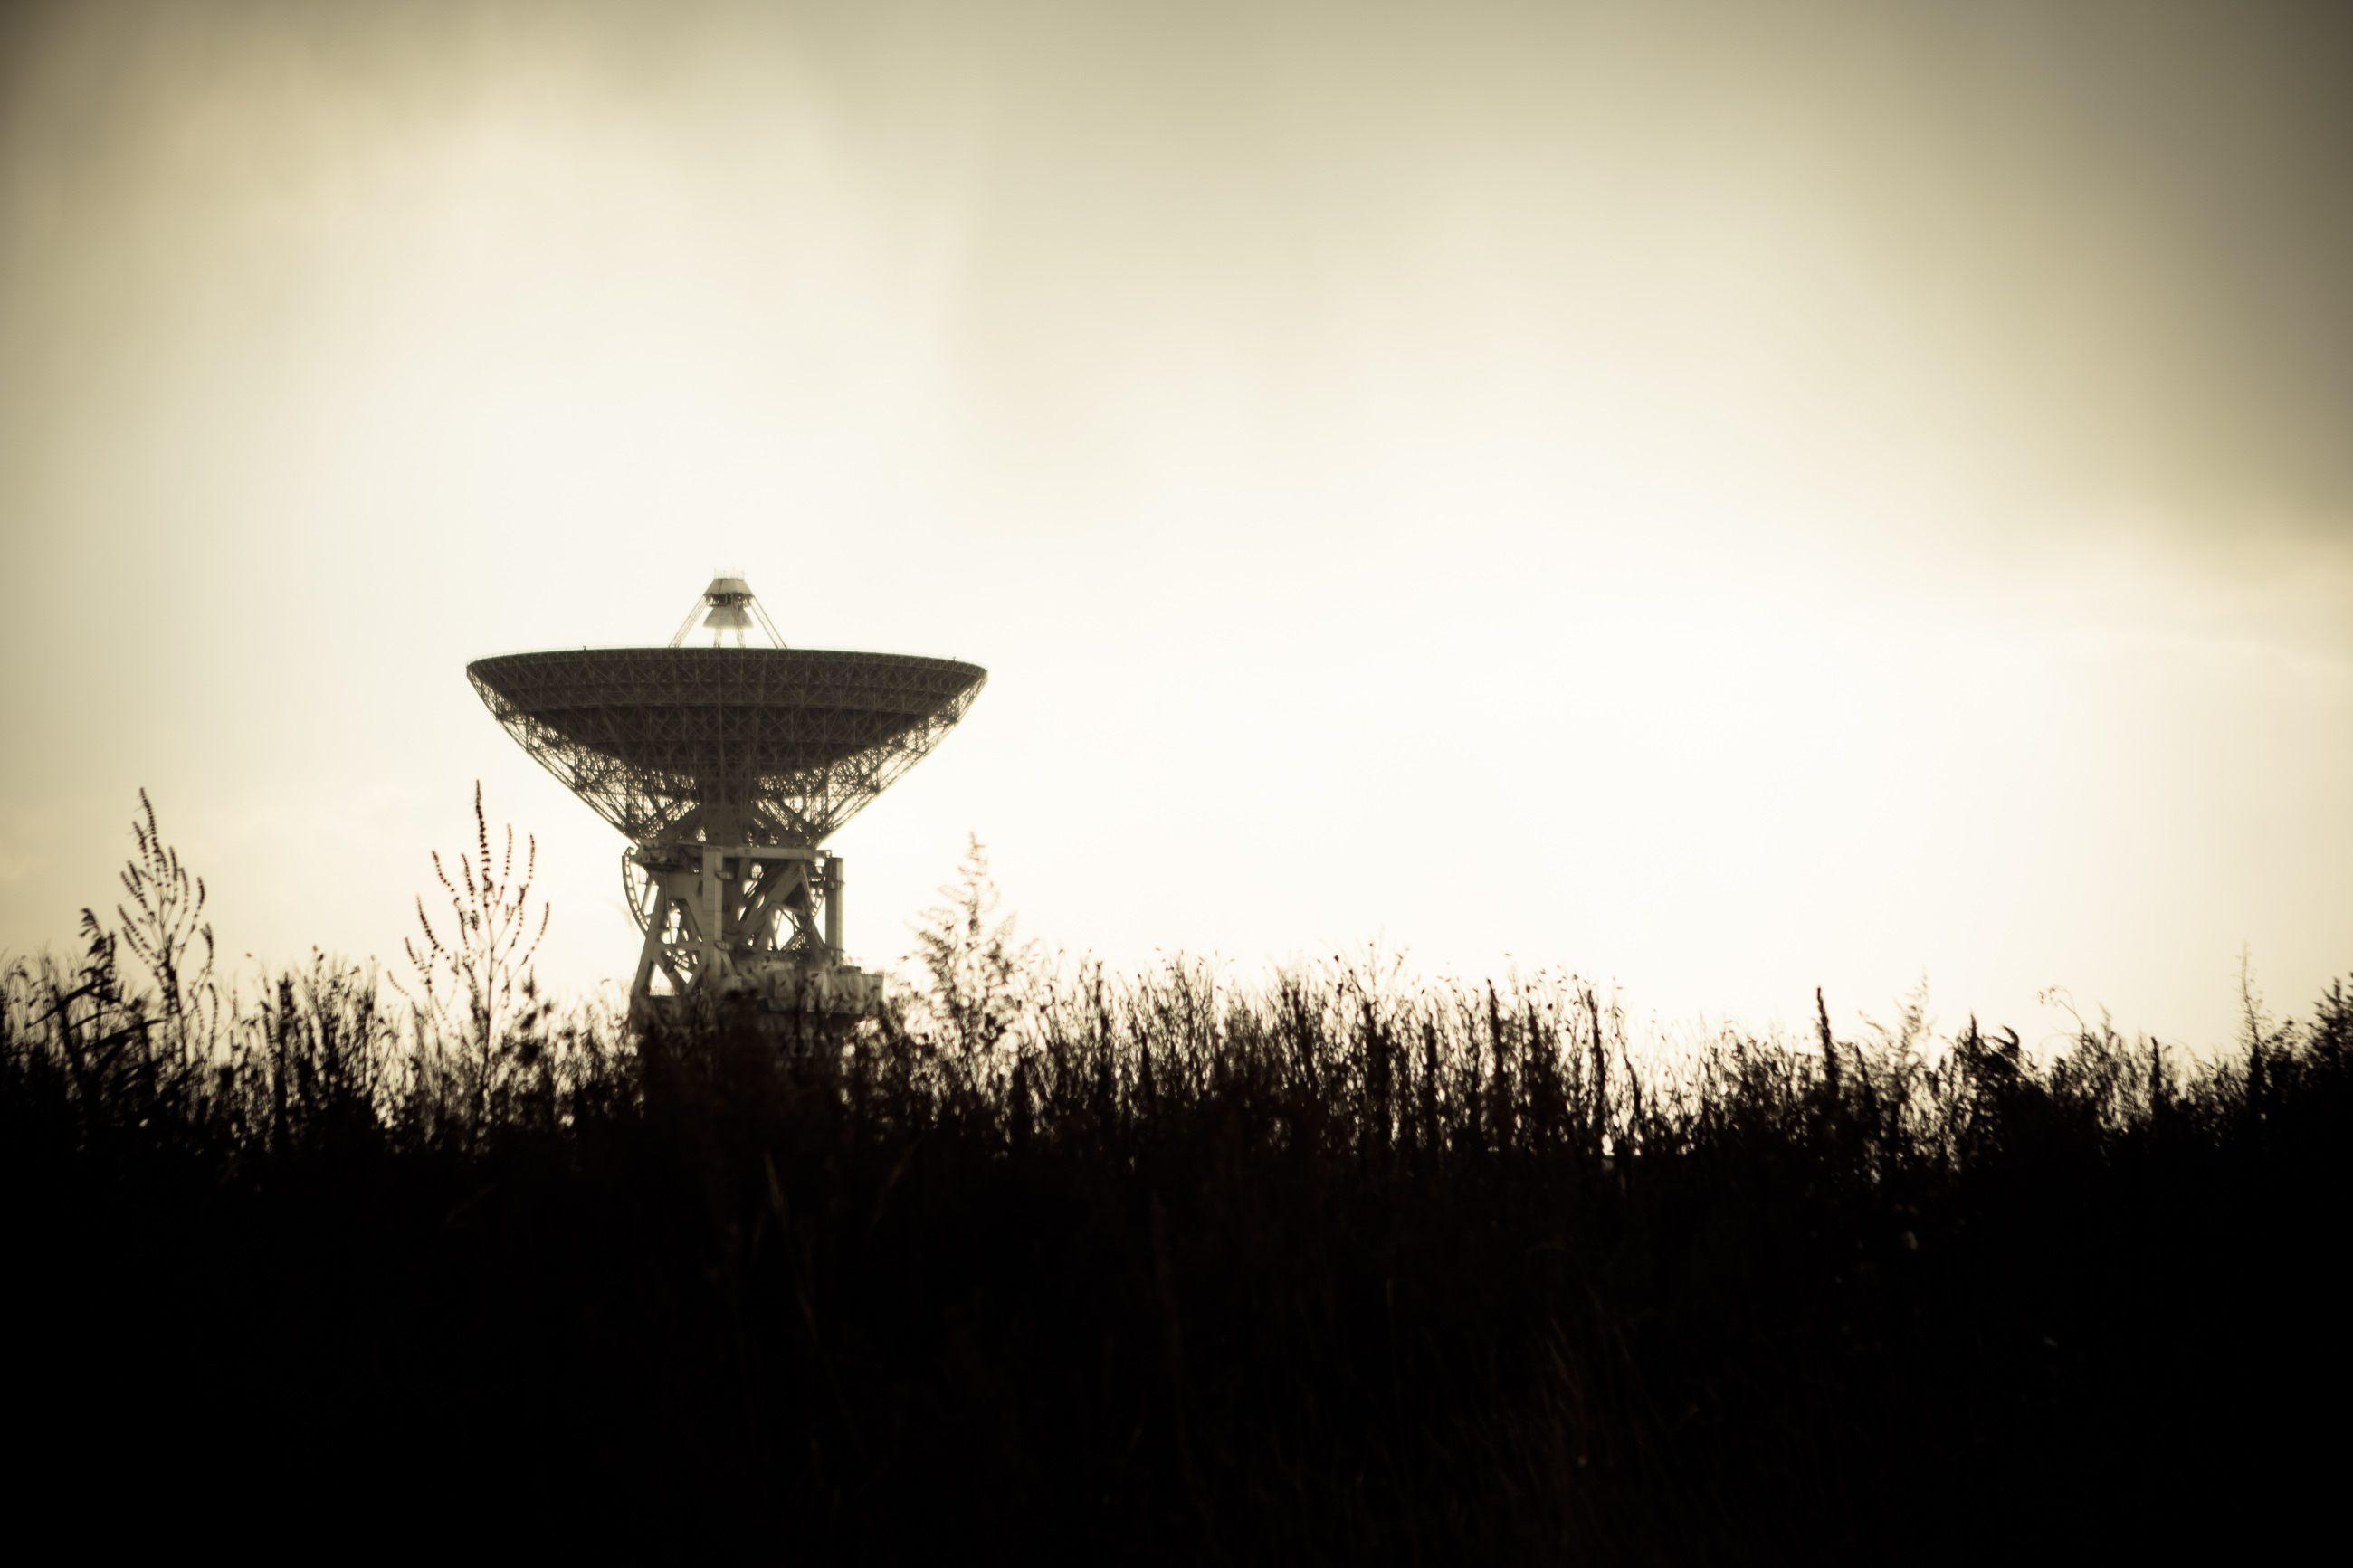 Satellite pointed upward